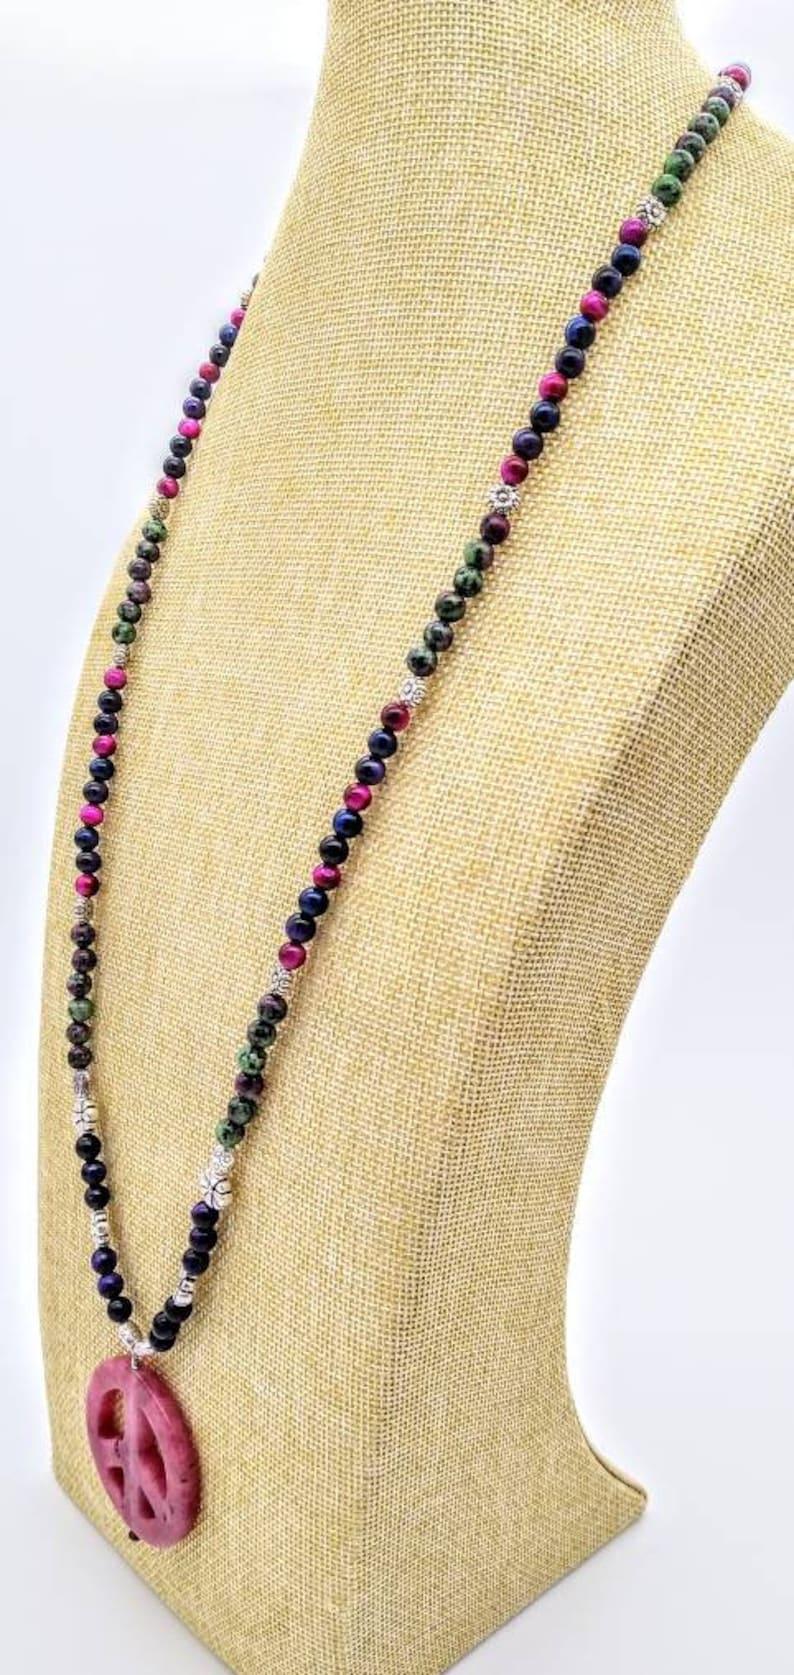 peace symbol necklace boho gemstone beaded necklace with peace symbol pendant reiki gemstone beaded peace necklace